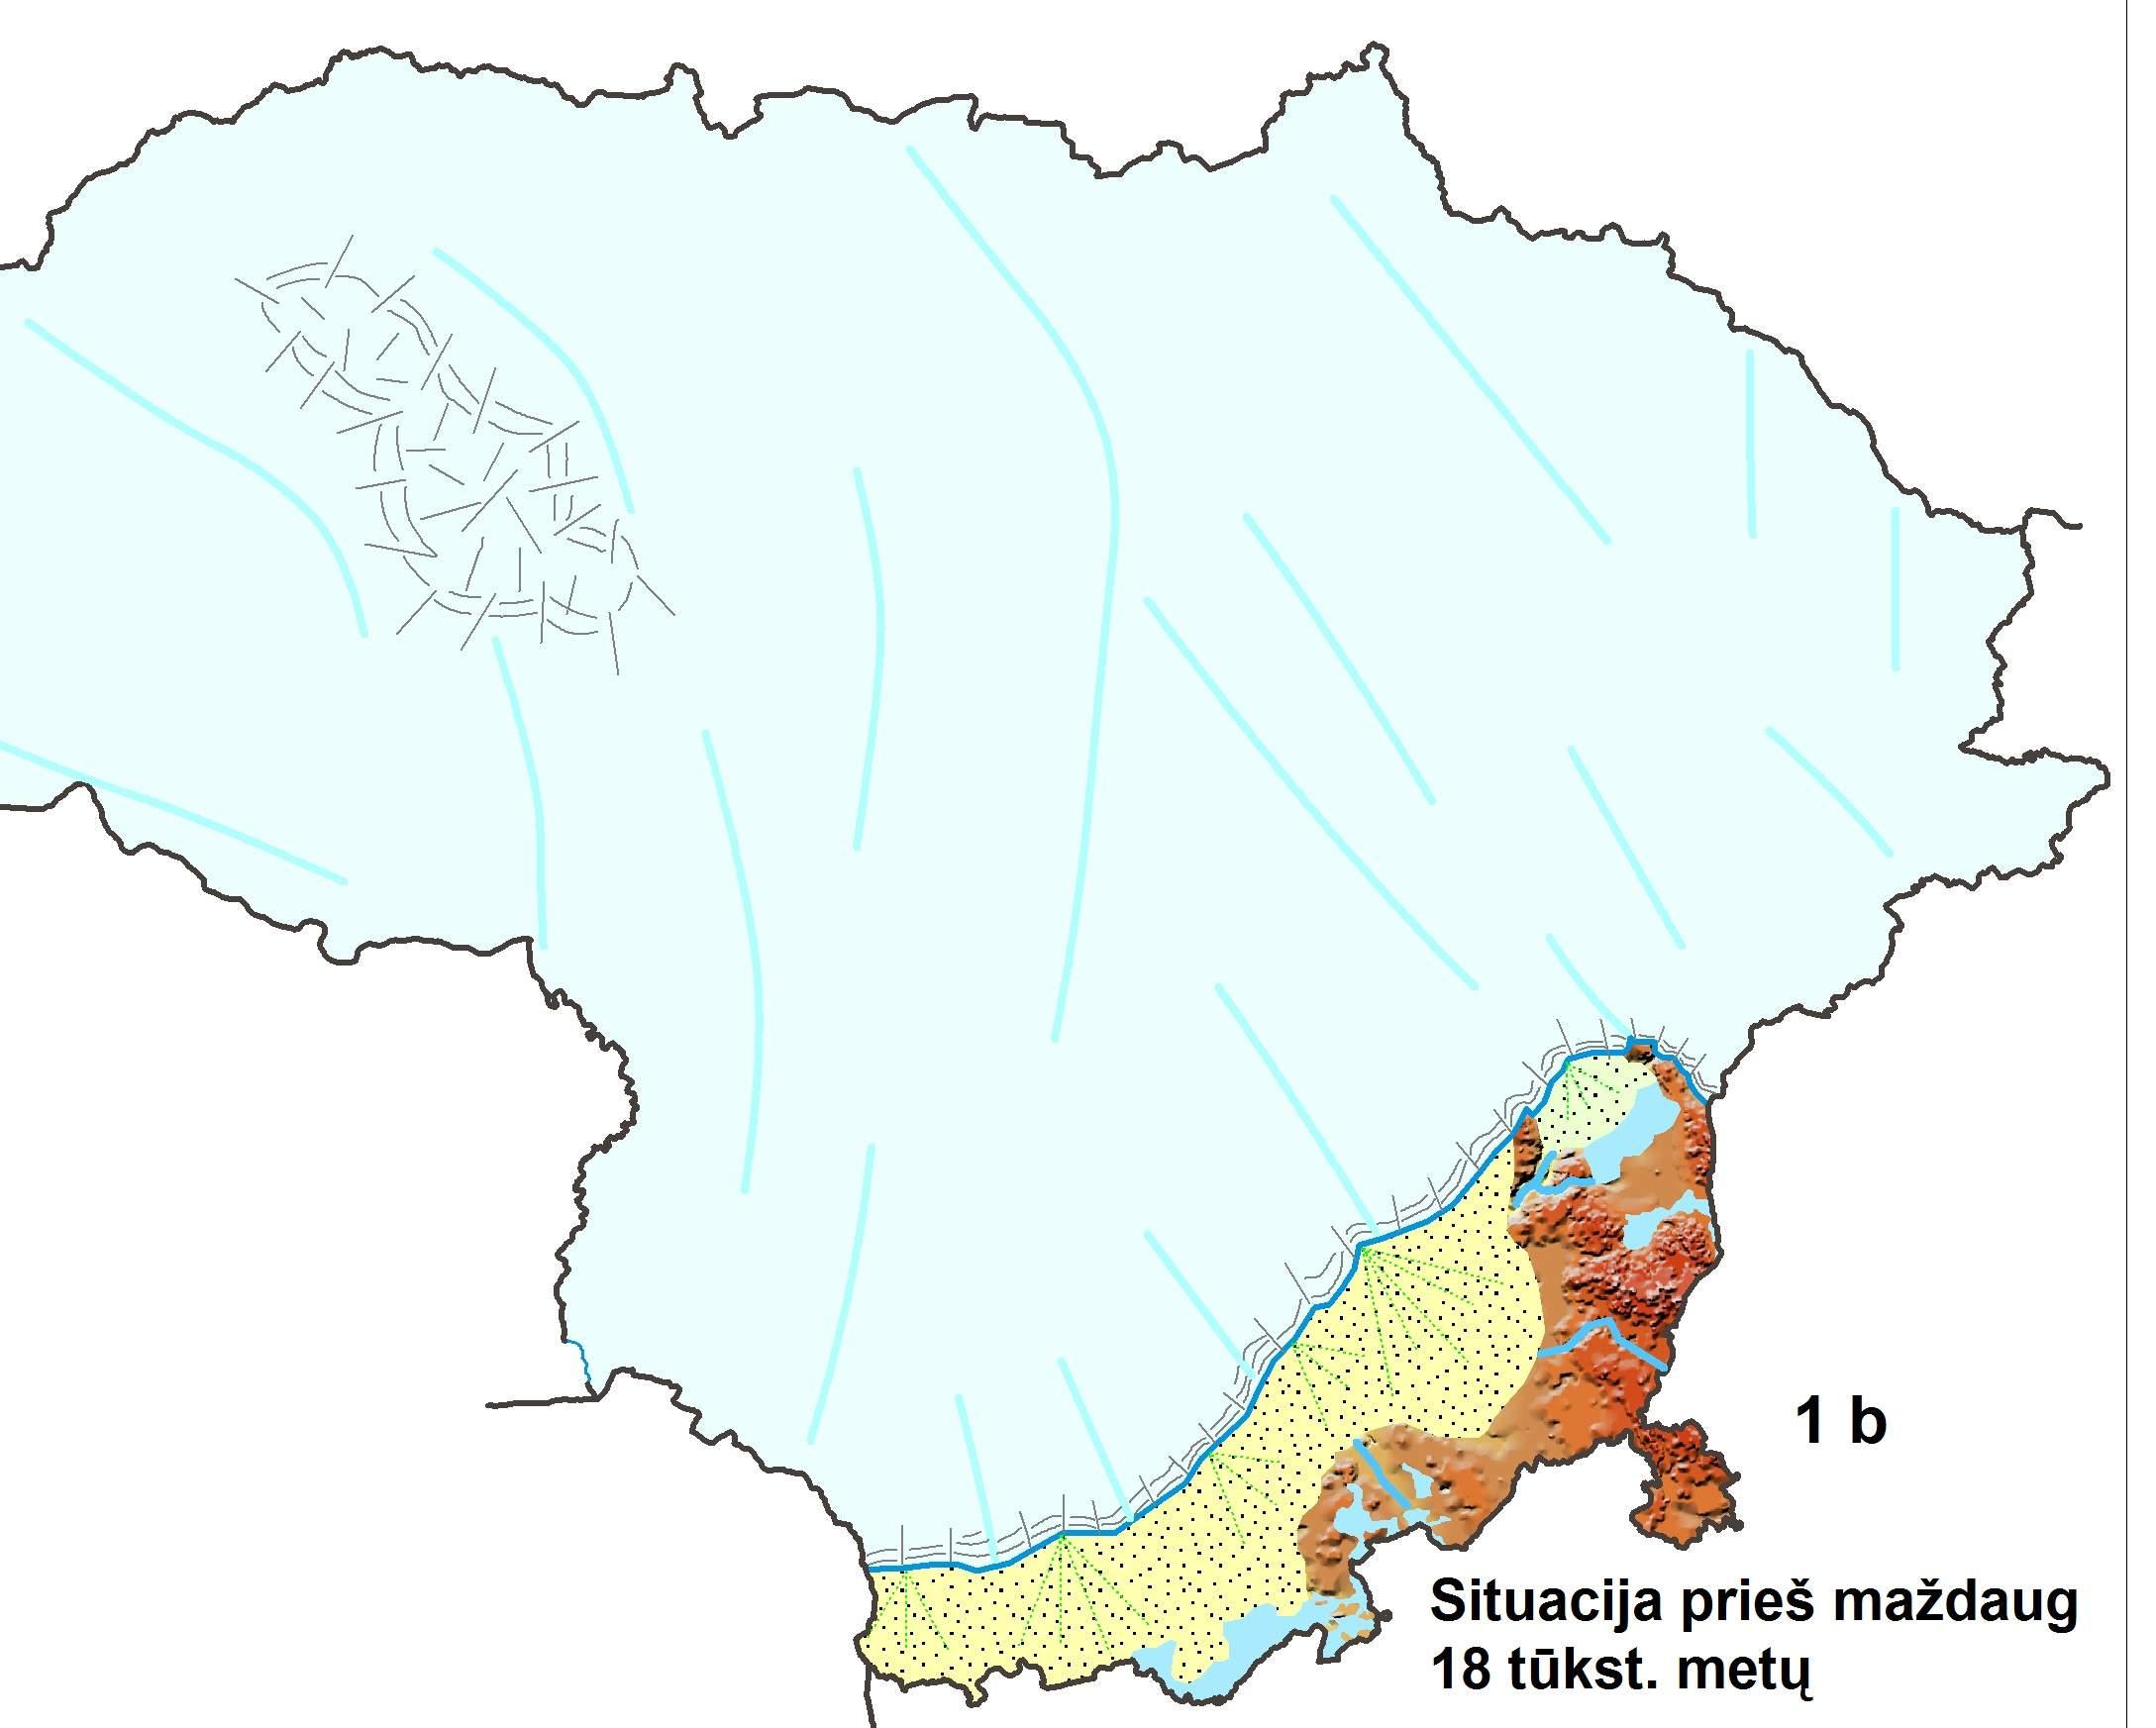 1 pav. B – Lietuvos nuledėjimo schema pagal R. Guobytę, 2015